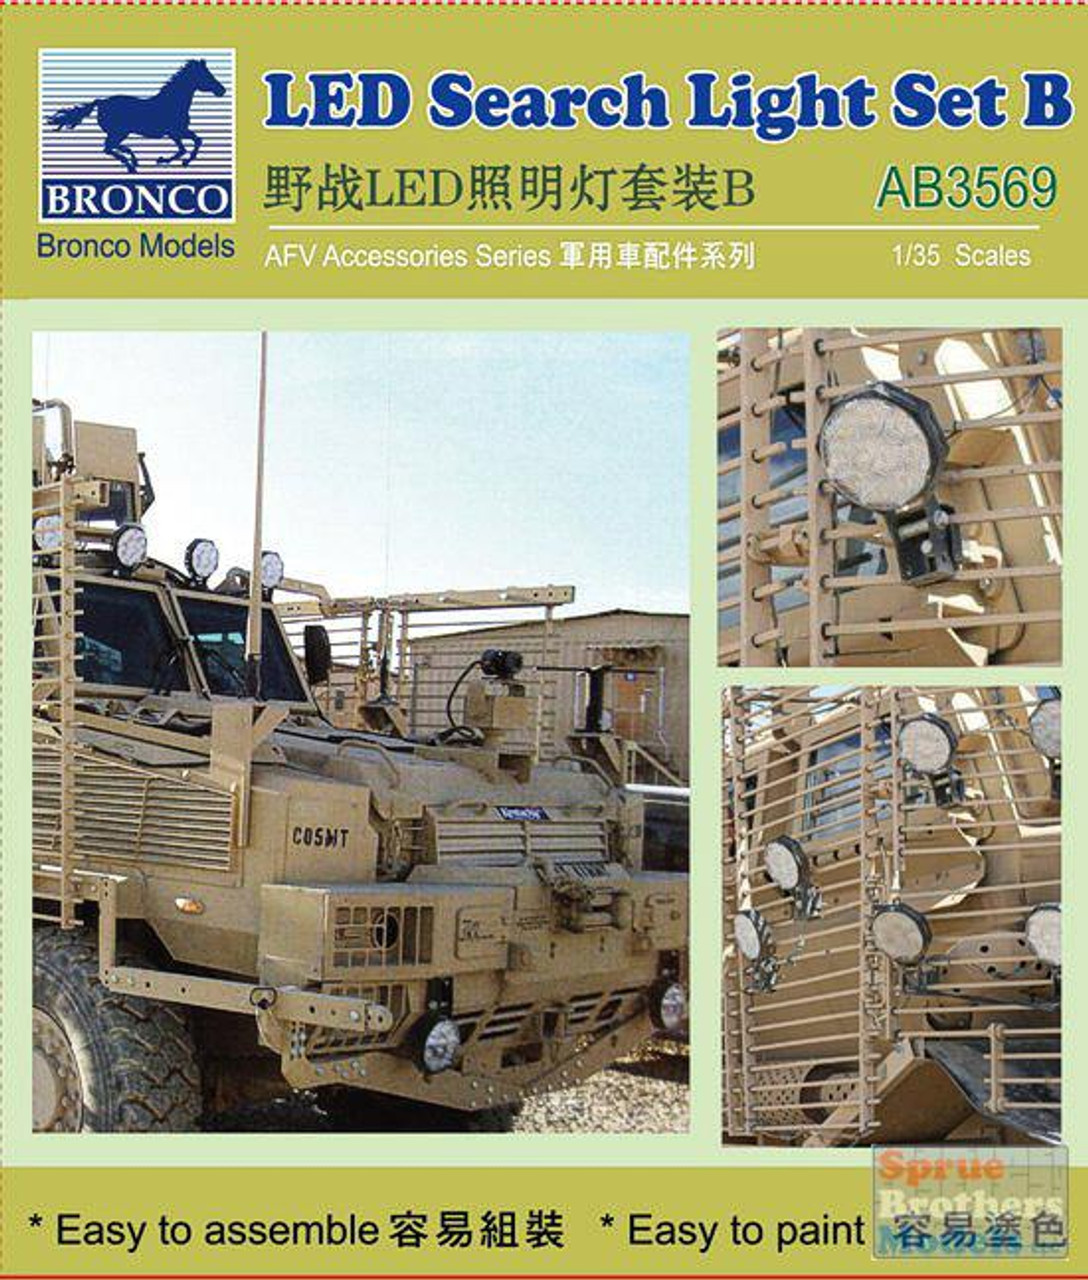 BNCAB3569 1:35 Bronco LED Search Light Set B